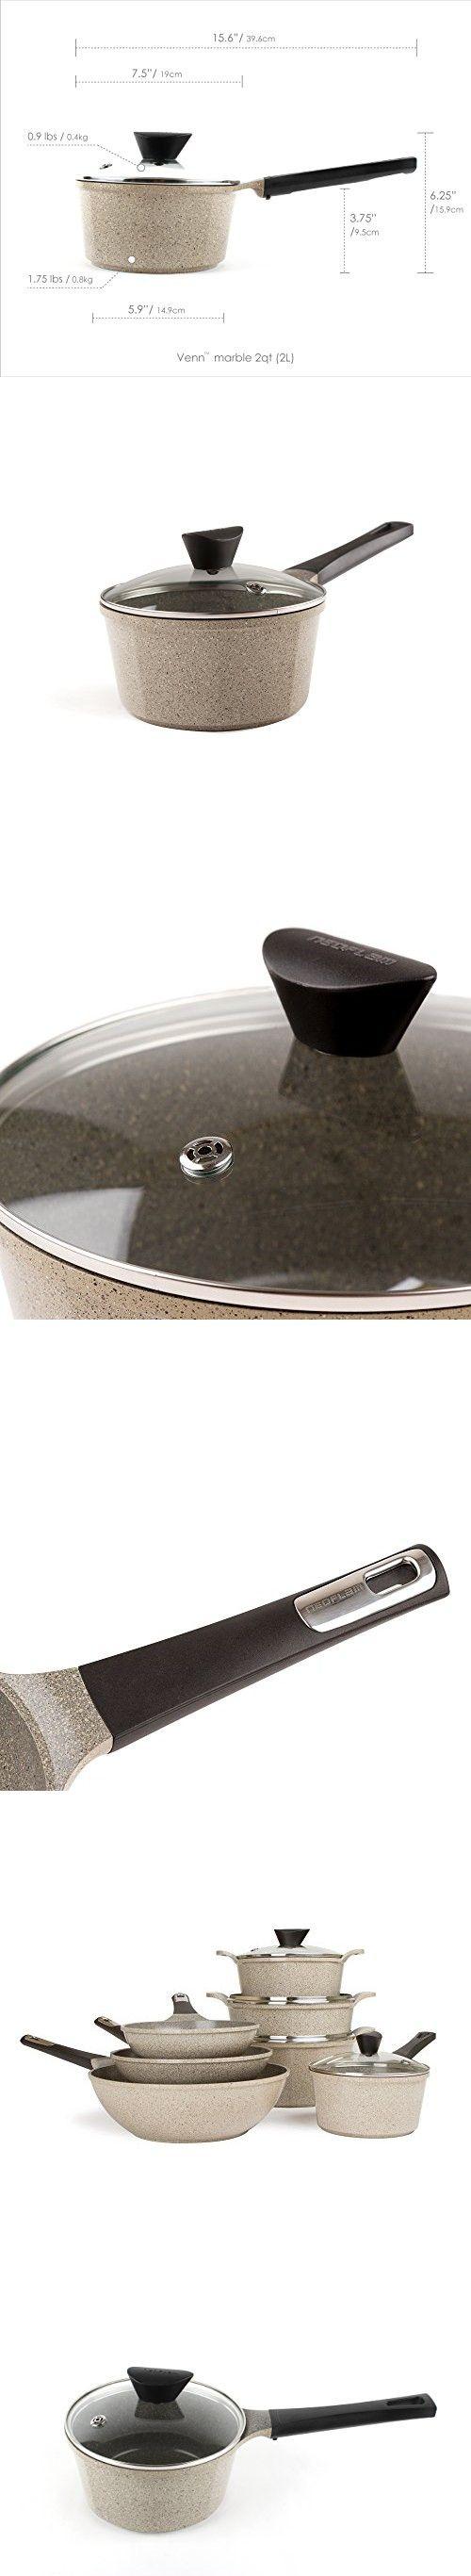 Neoflam Venn 2QT Ceramic Nonstick Saucepan w/ Glass Lid, Marble